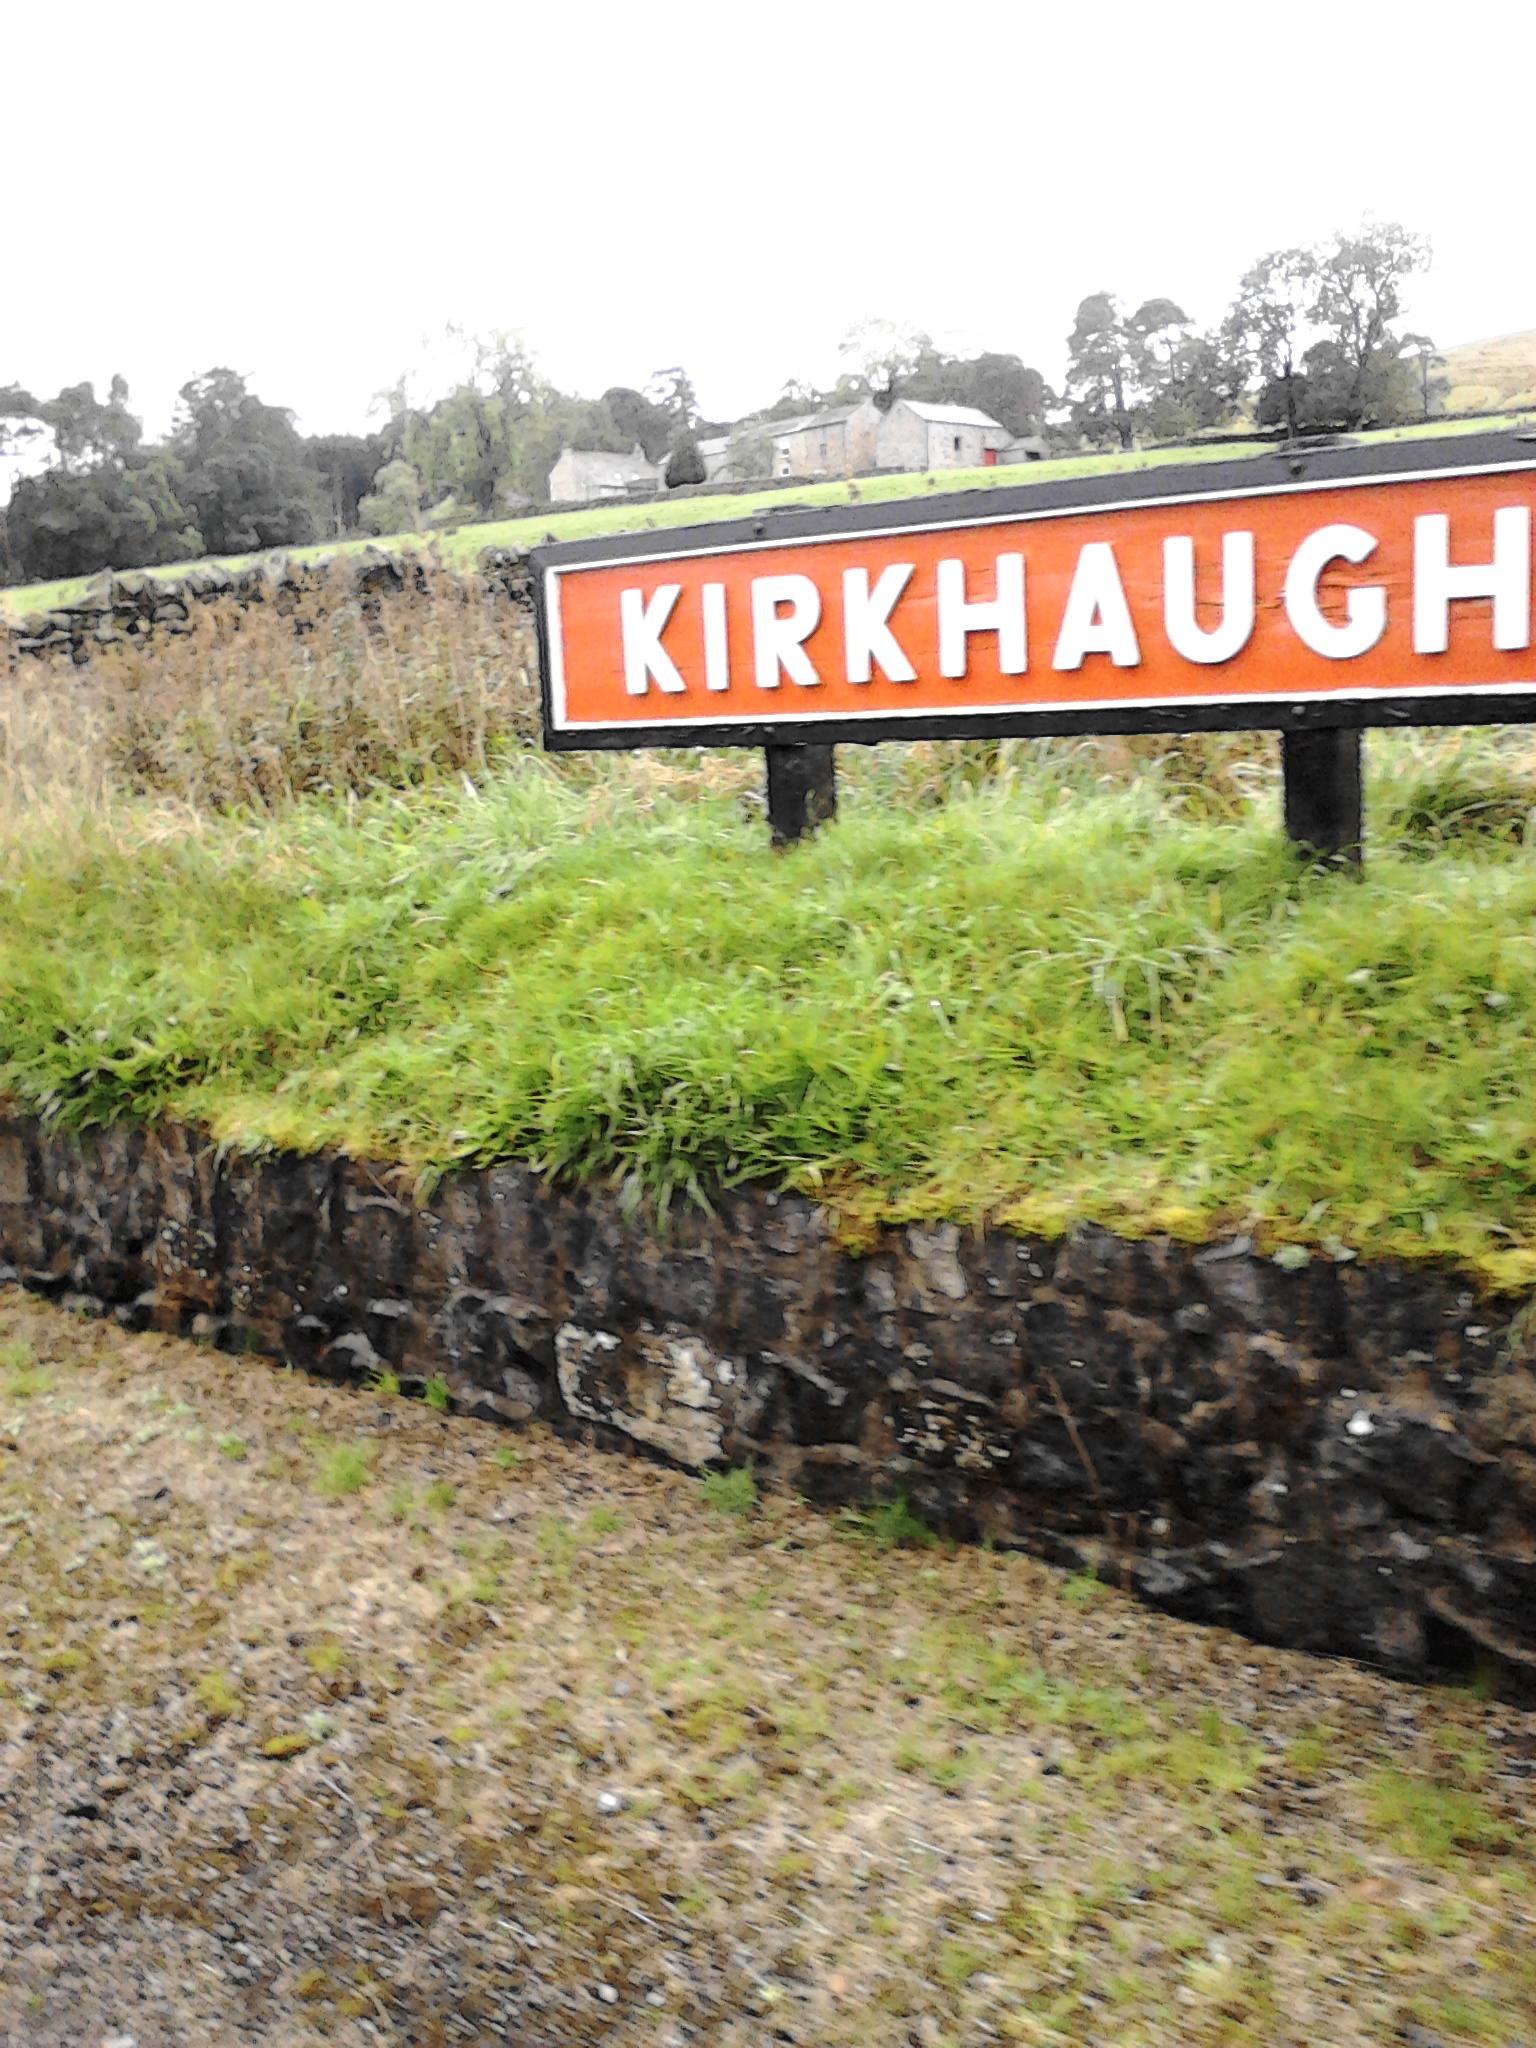 Kirkhaugh